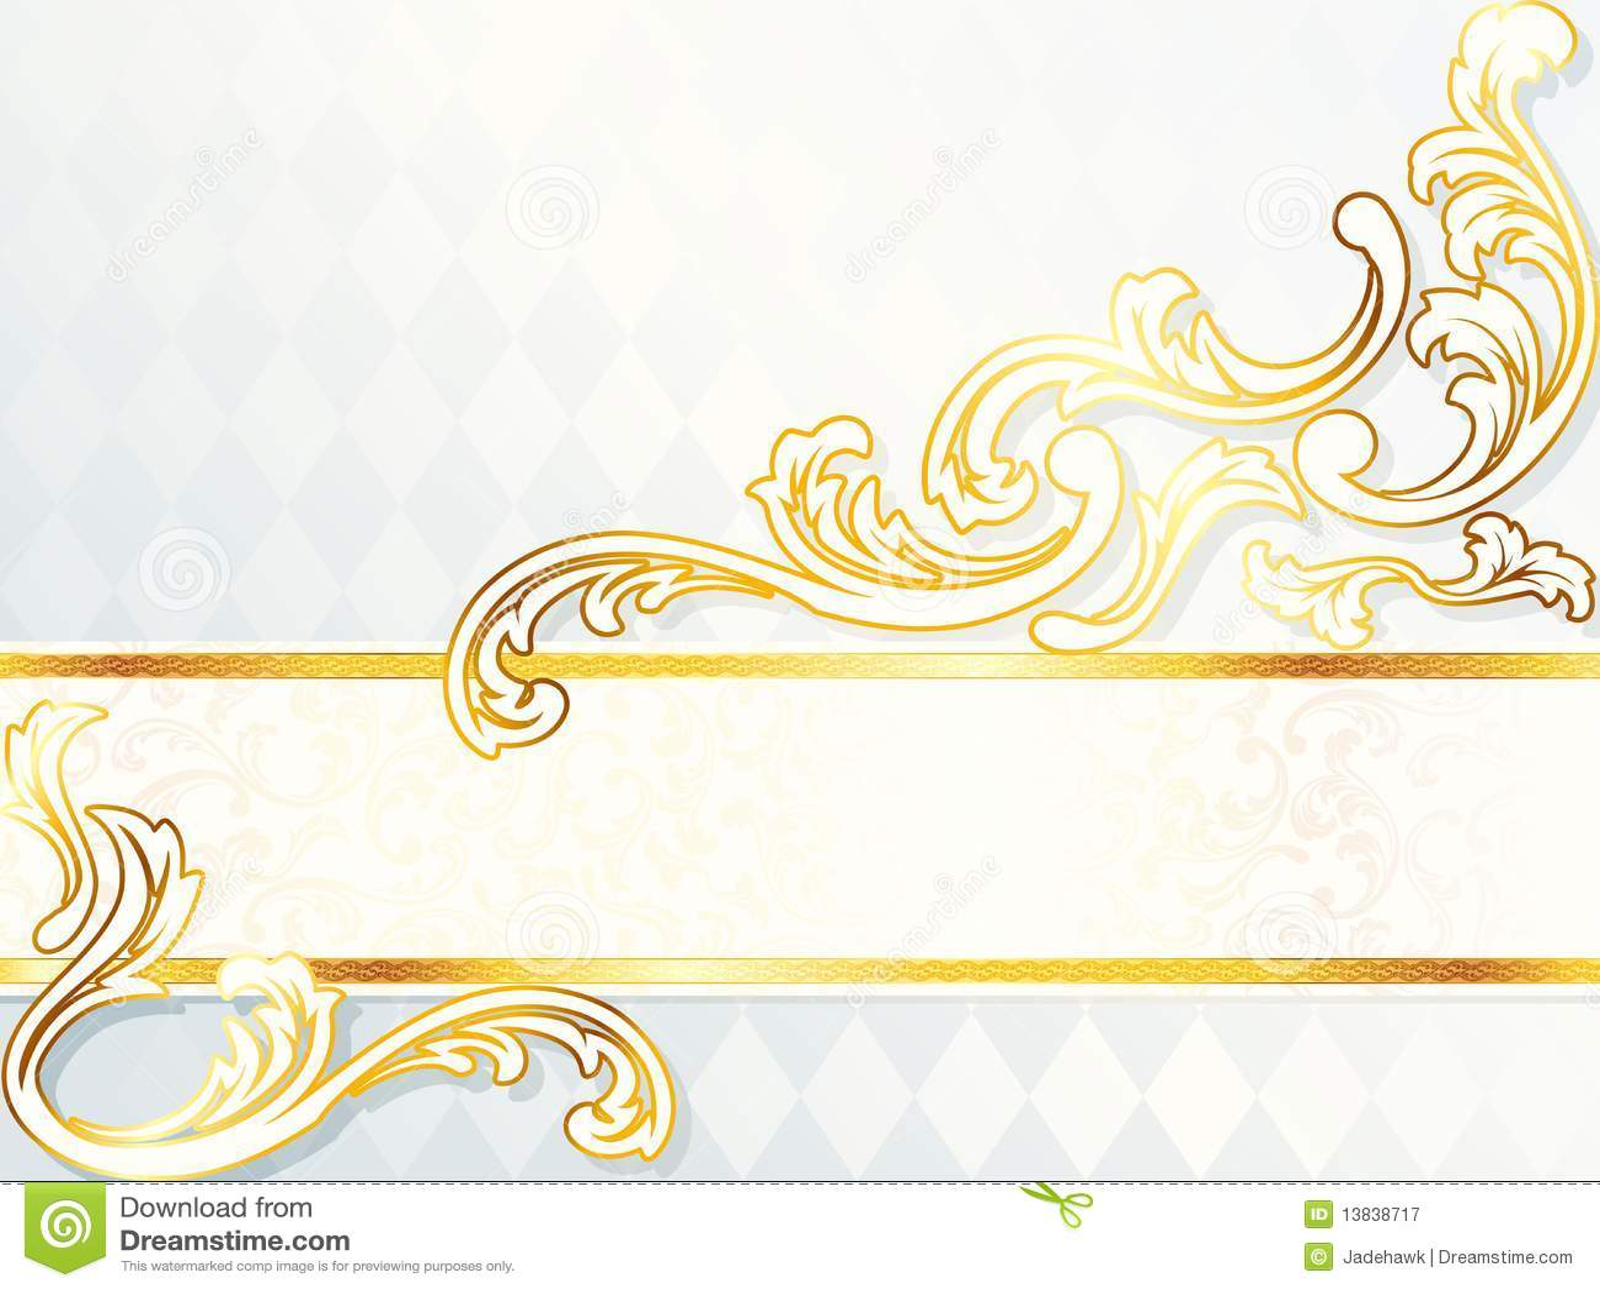 banner beautiful elegant gold horizontal rococo wedding